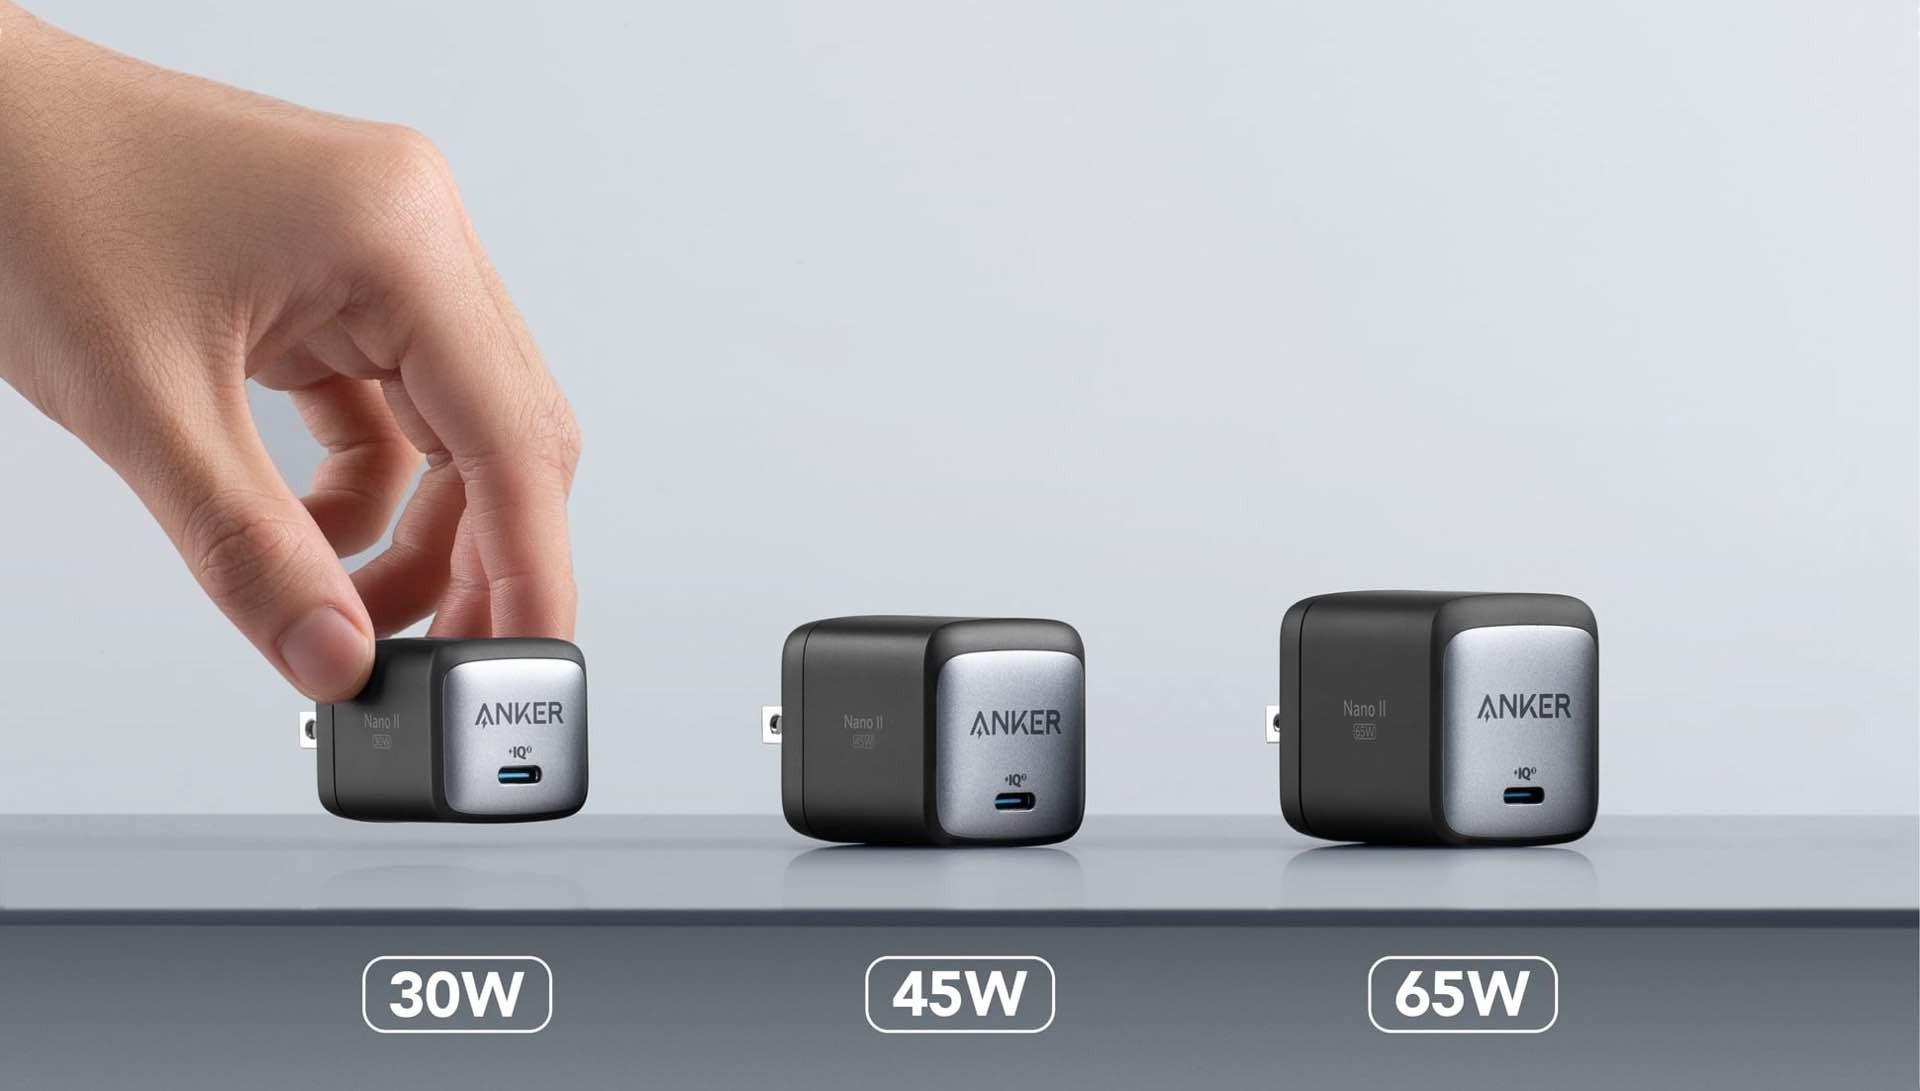 anker-nano-ii-gan-ii-portable-usb-c-chargers-comparison